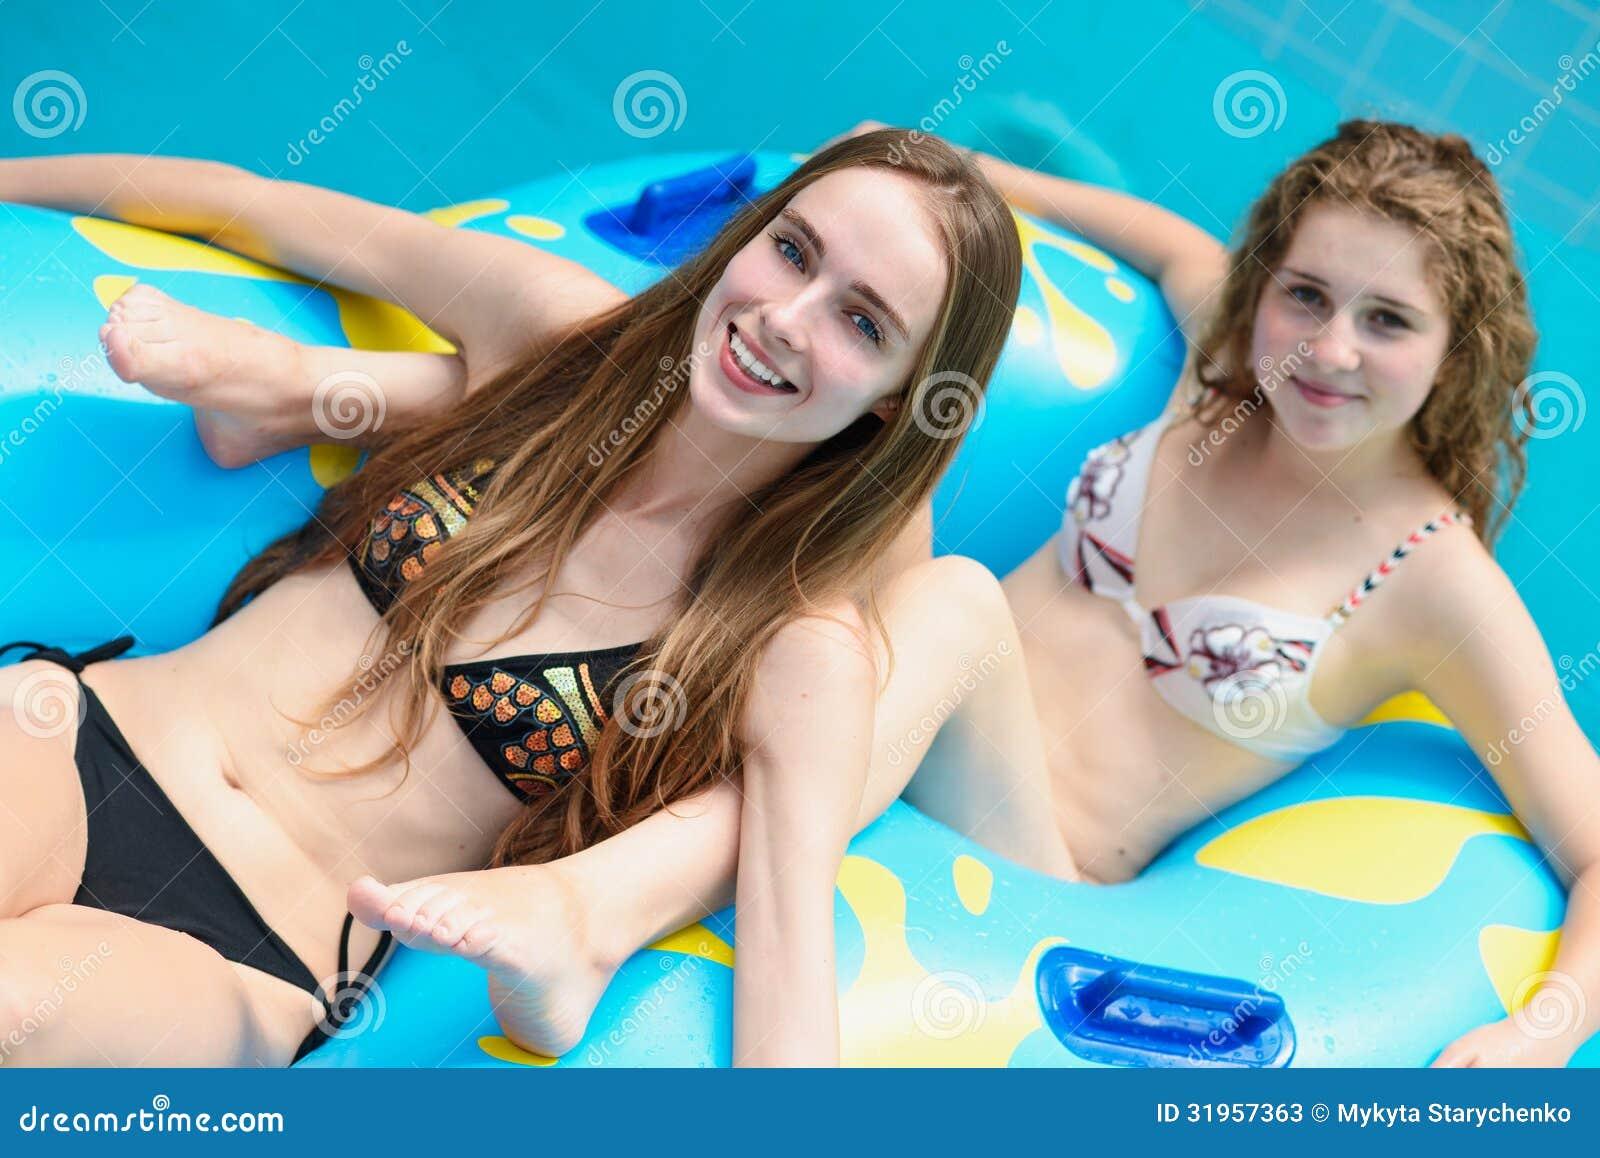 Bikini park water